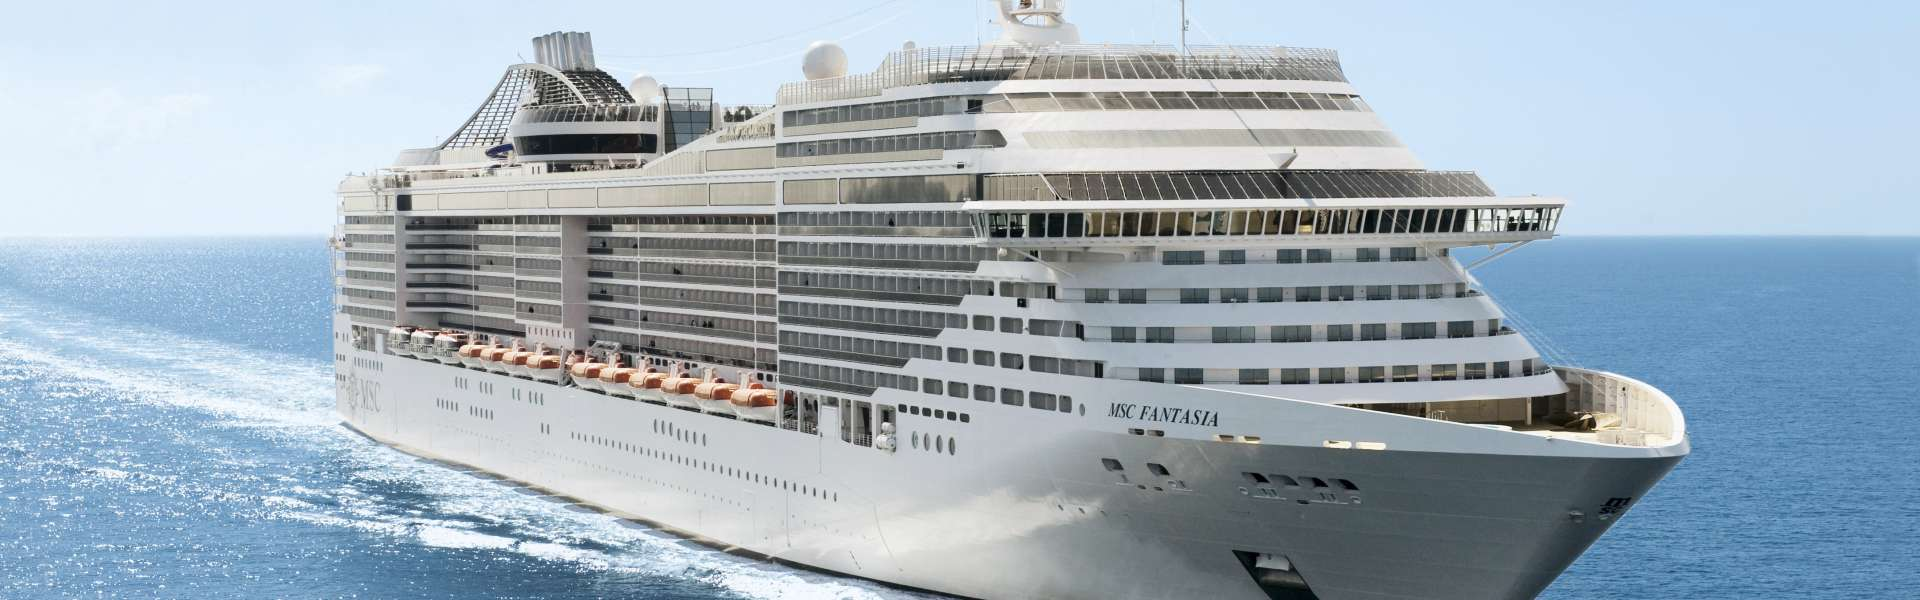 Croaziera 2019 - Mediterana de Vest (Genova) - MSC Cruises - MSC Fantasia - 7 nopti